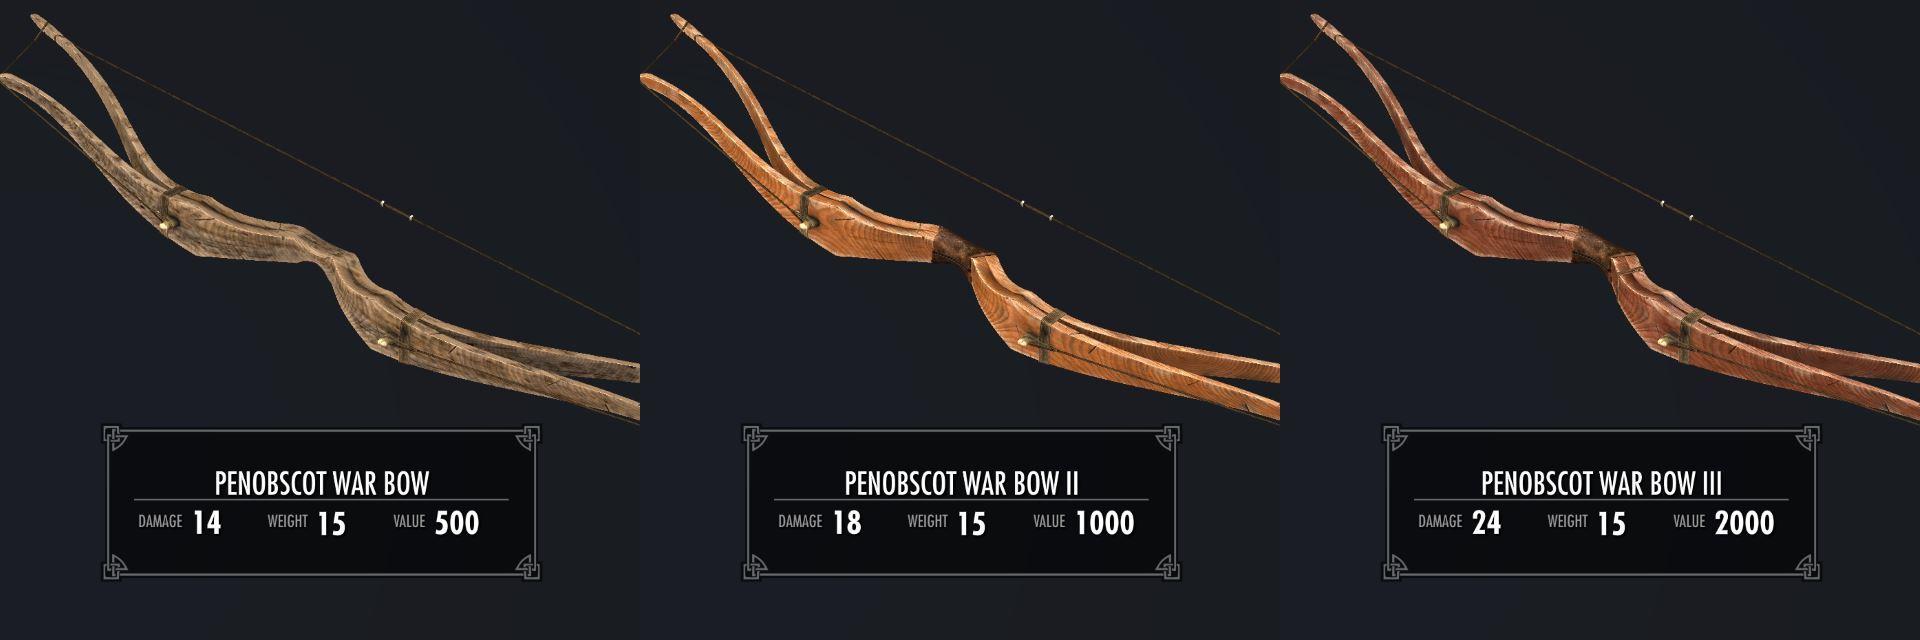 PenobscotWarBowSK 012-1 Info Bow3 2